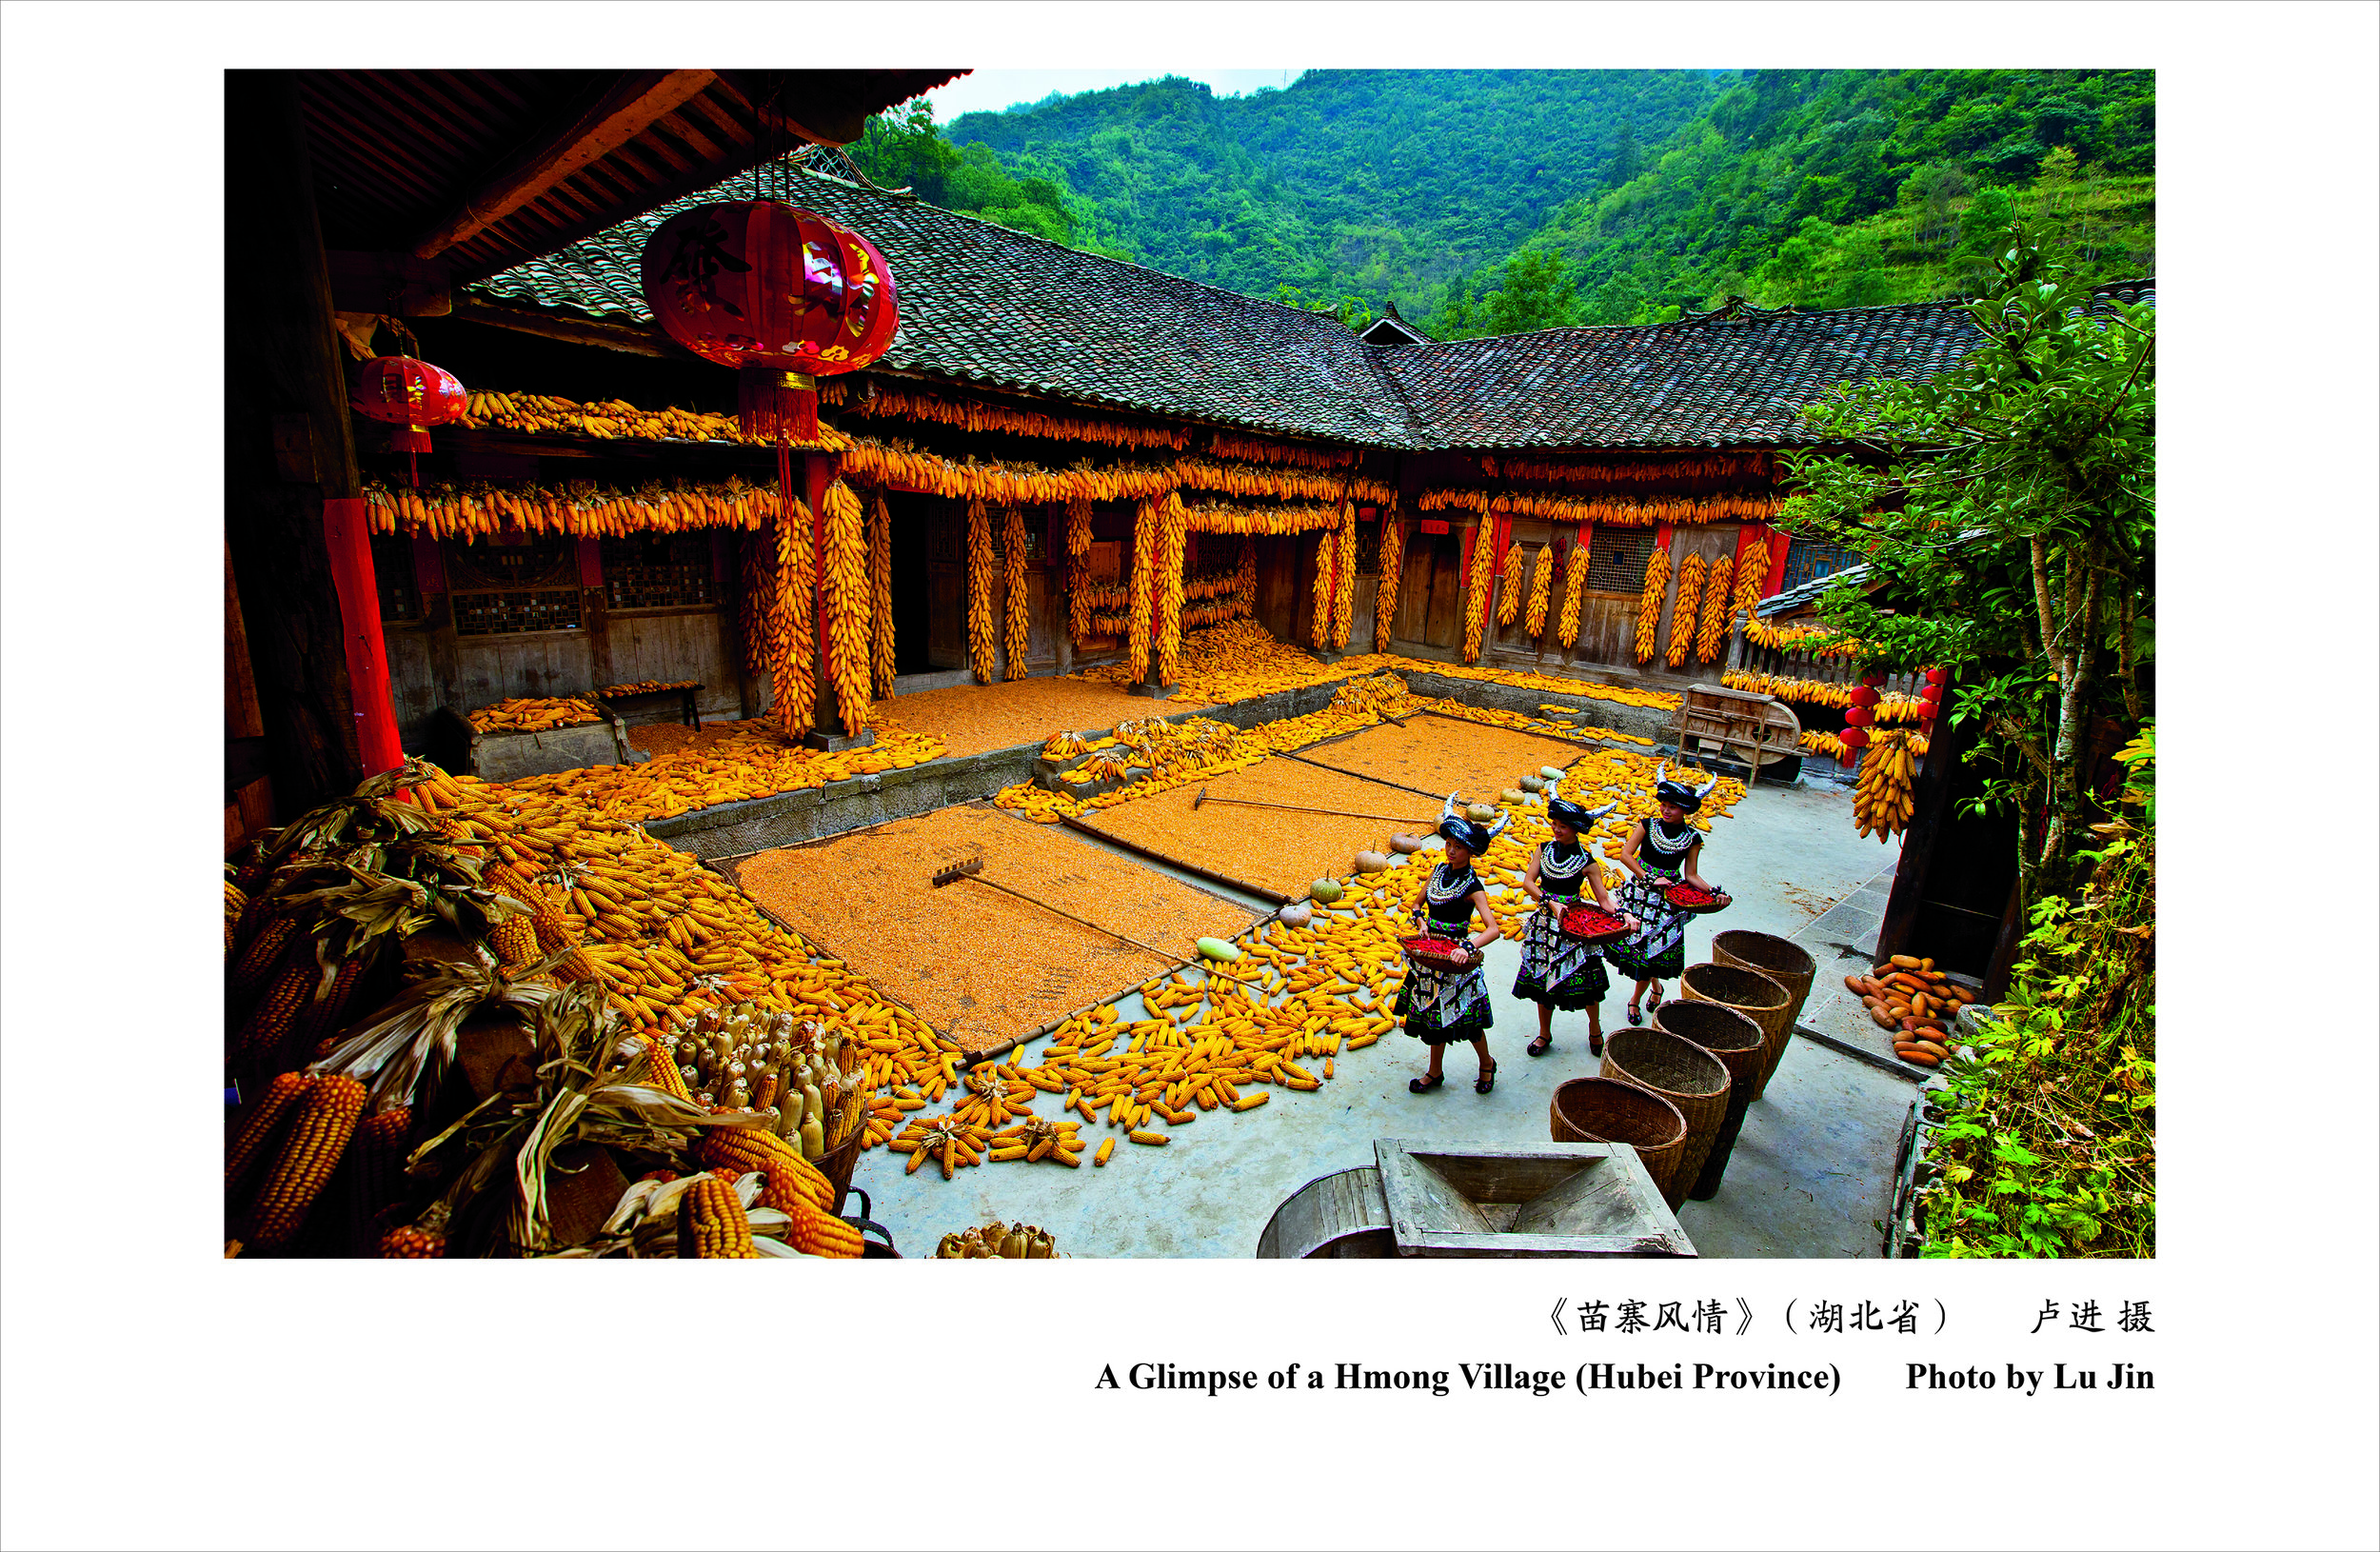 Copyright @China National Tourist Office